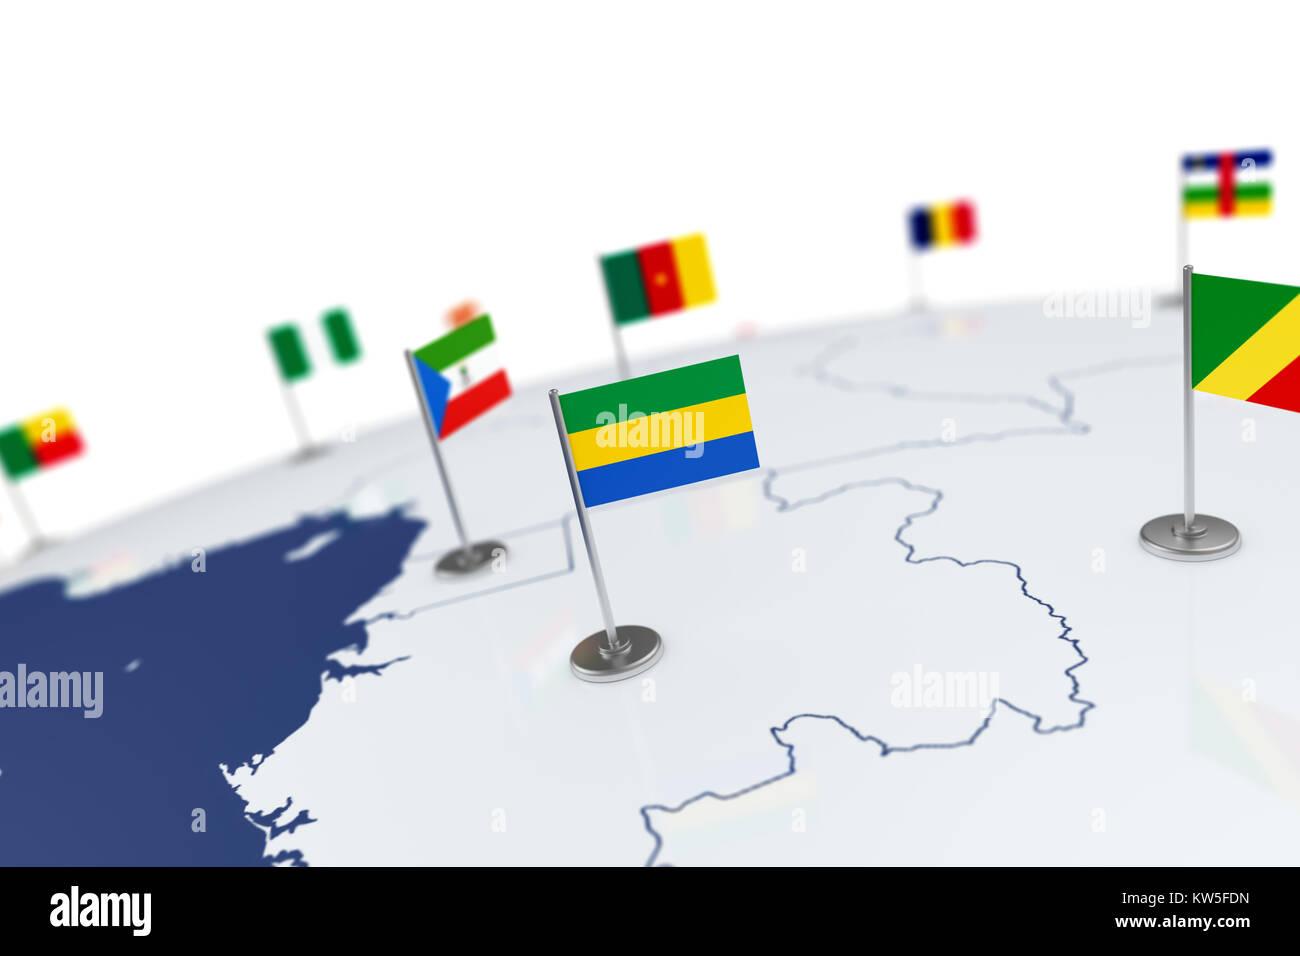 Gabon World Map.Gabon Flag Country Flag With Chrome Flagpole On The World Map With